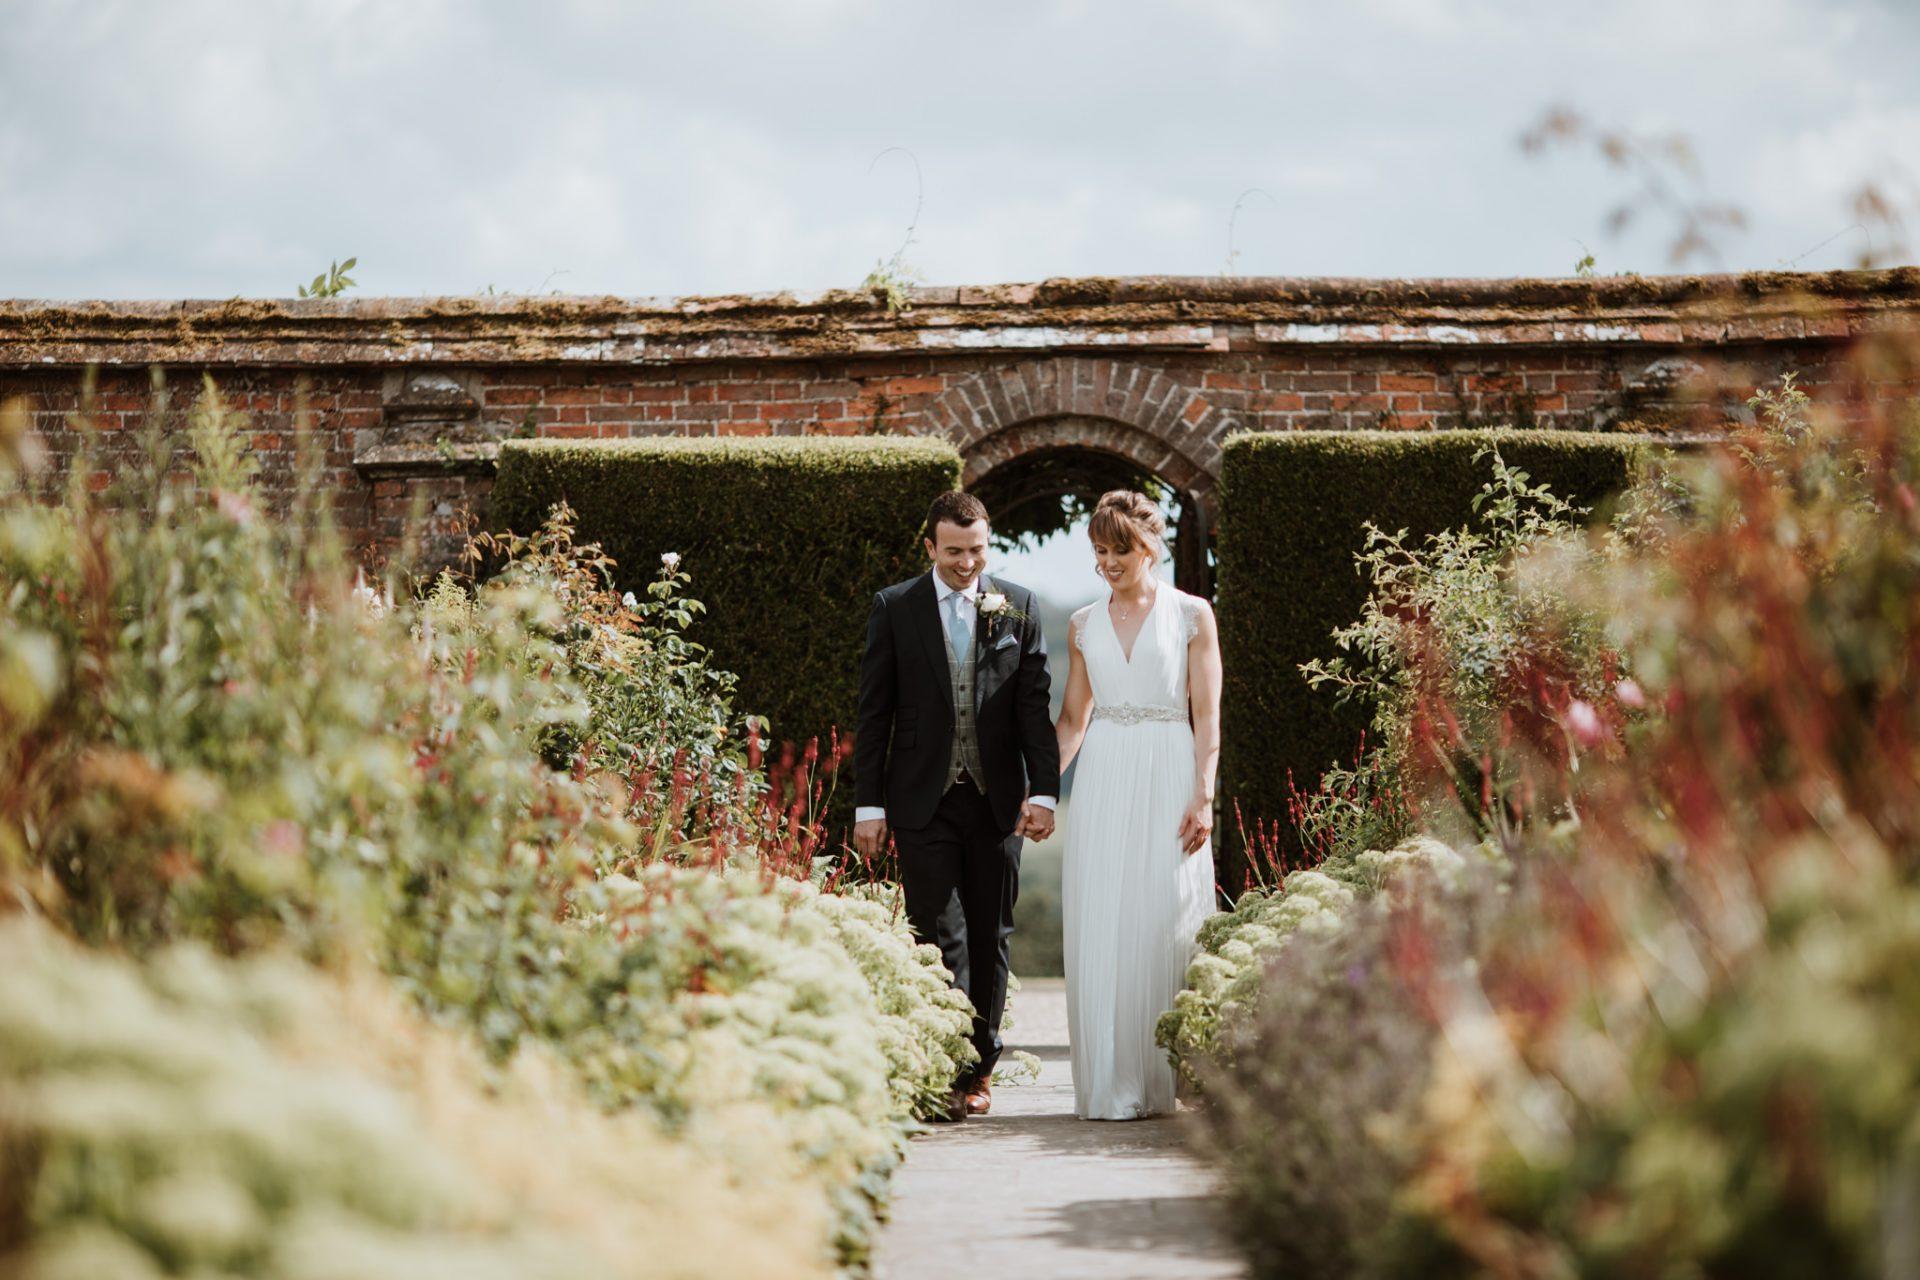 bride and groom walking holding hands through flower garden